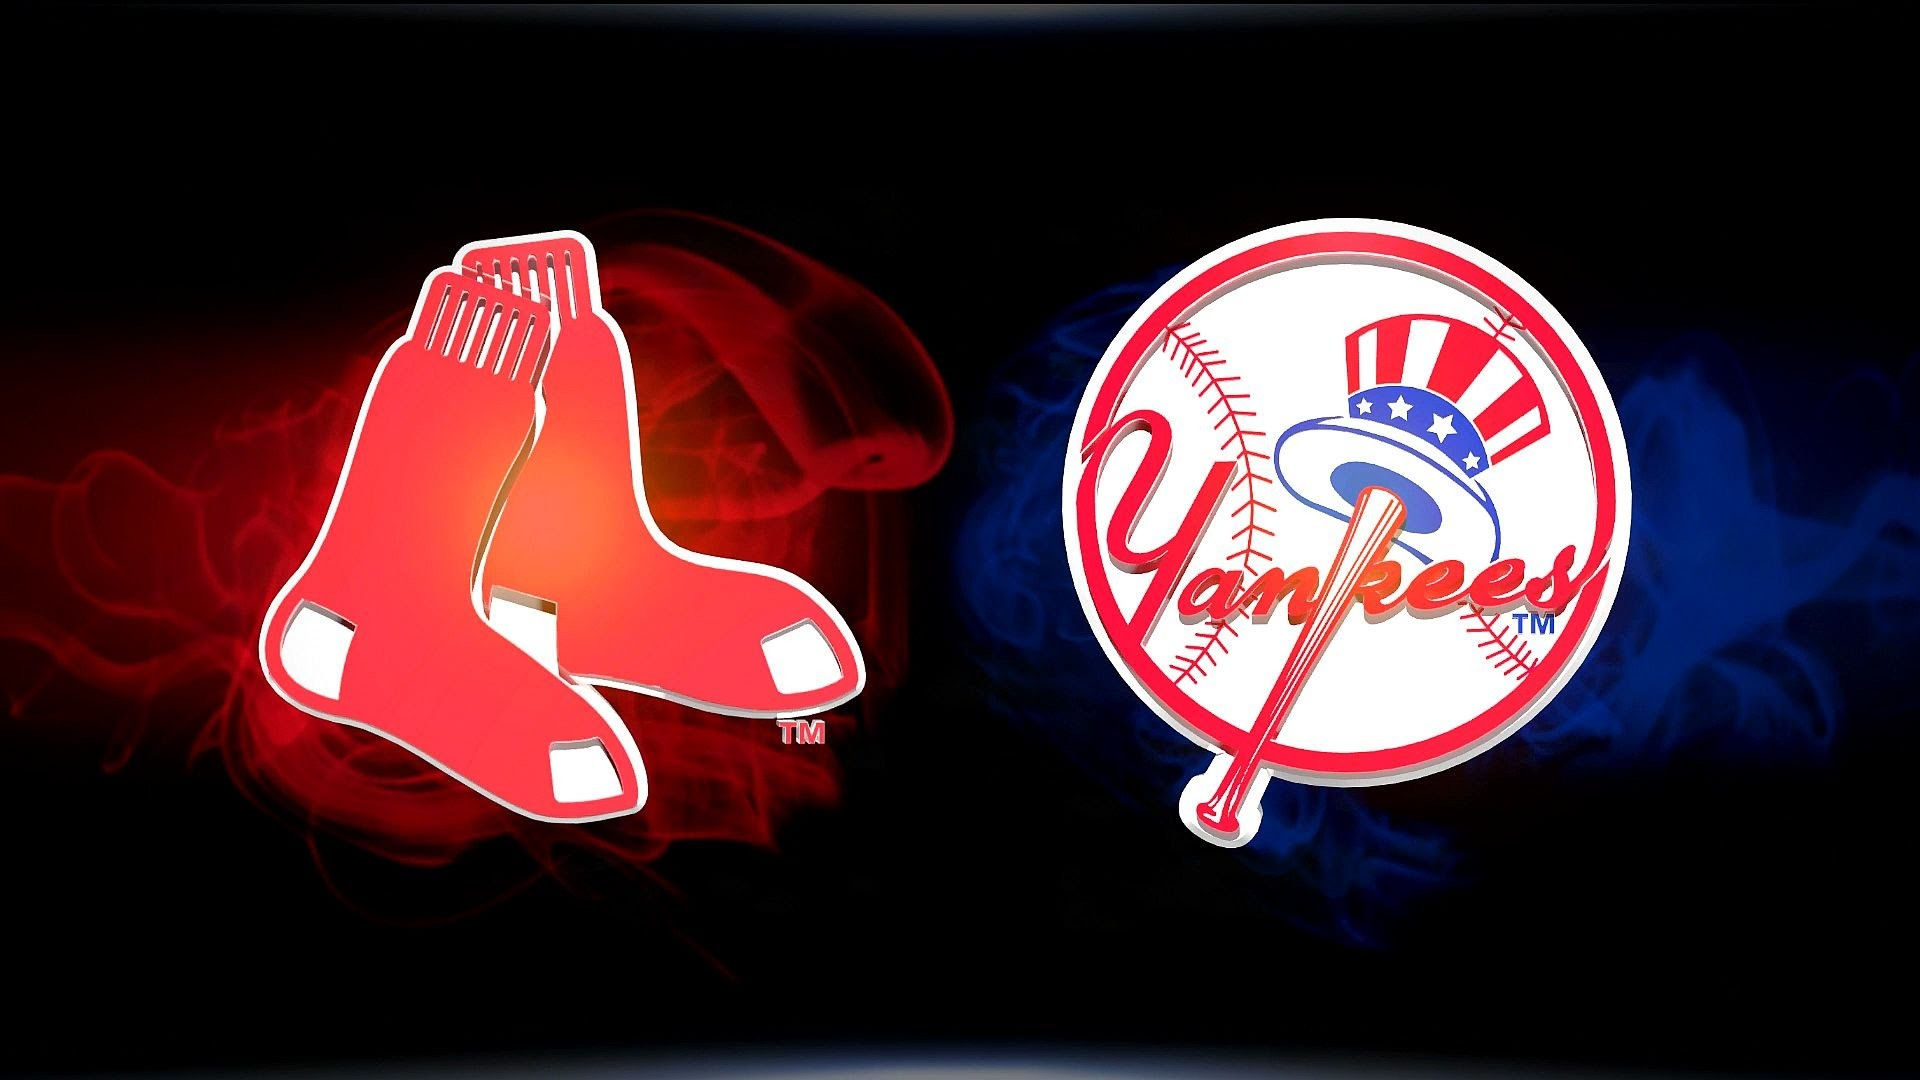 red sox vs yankees - photo #41